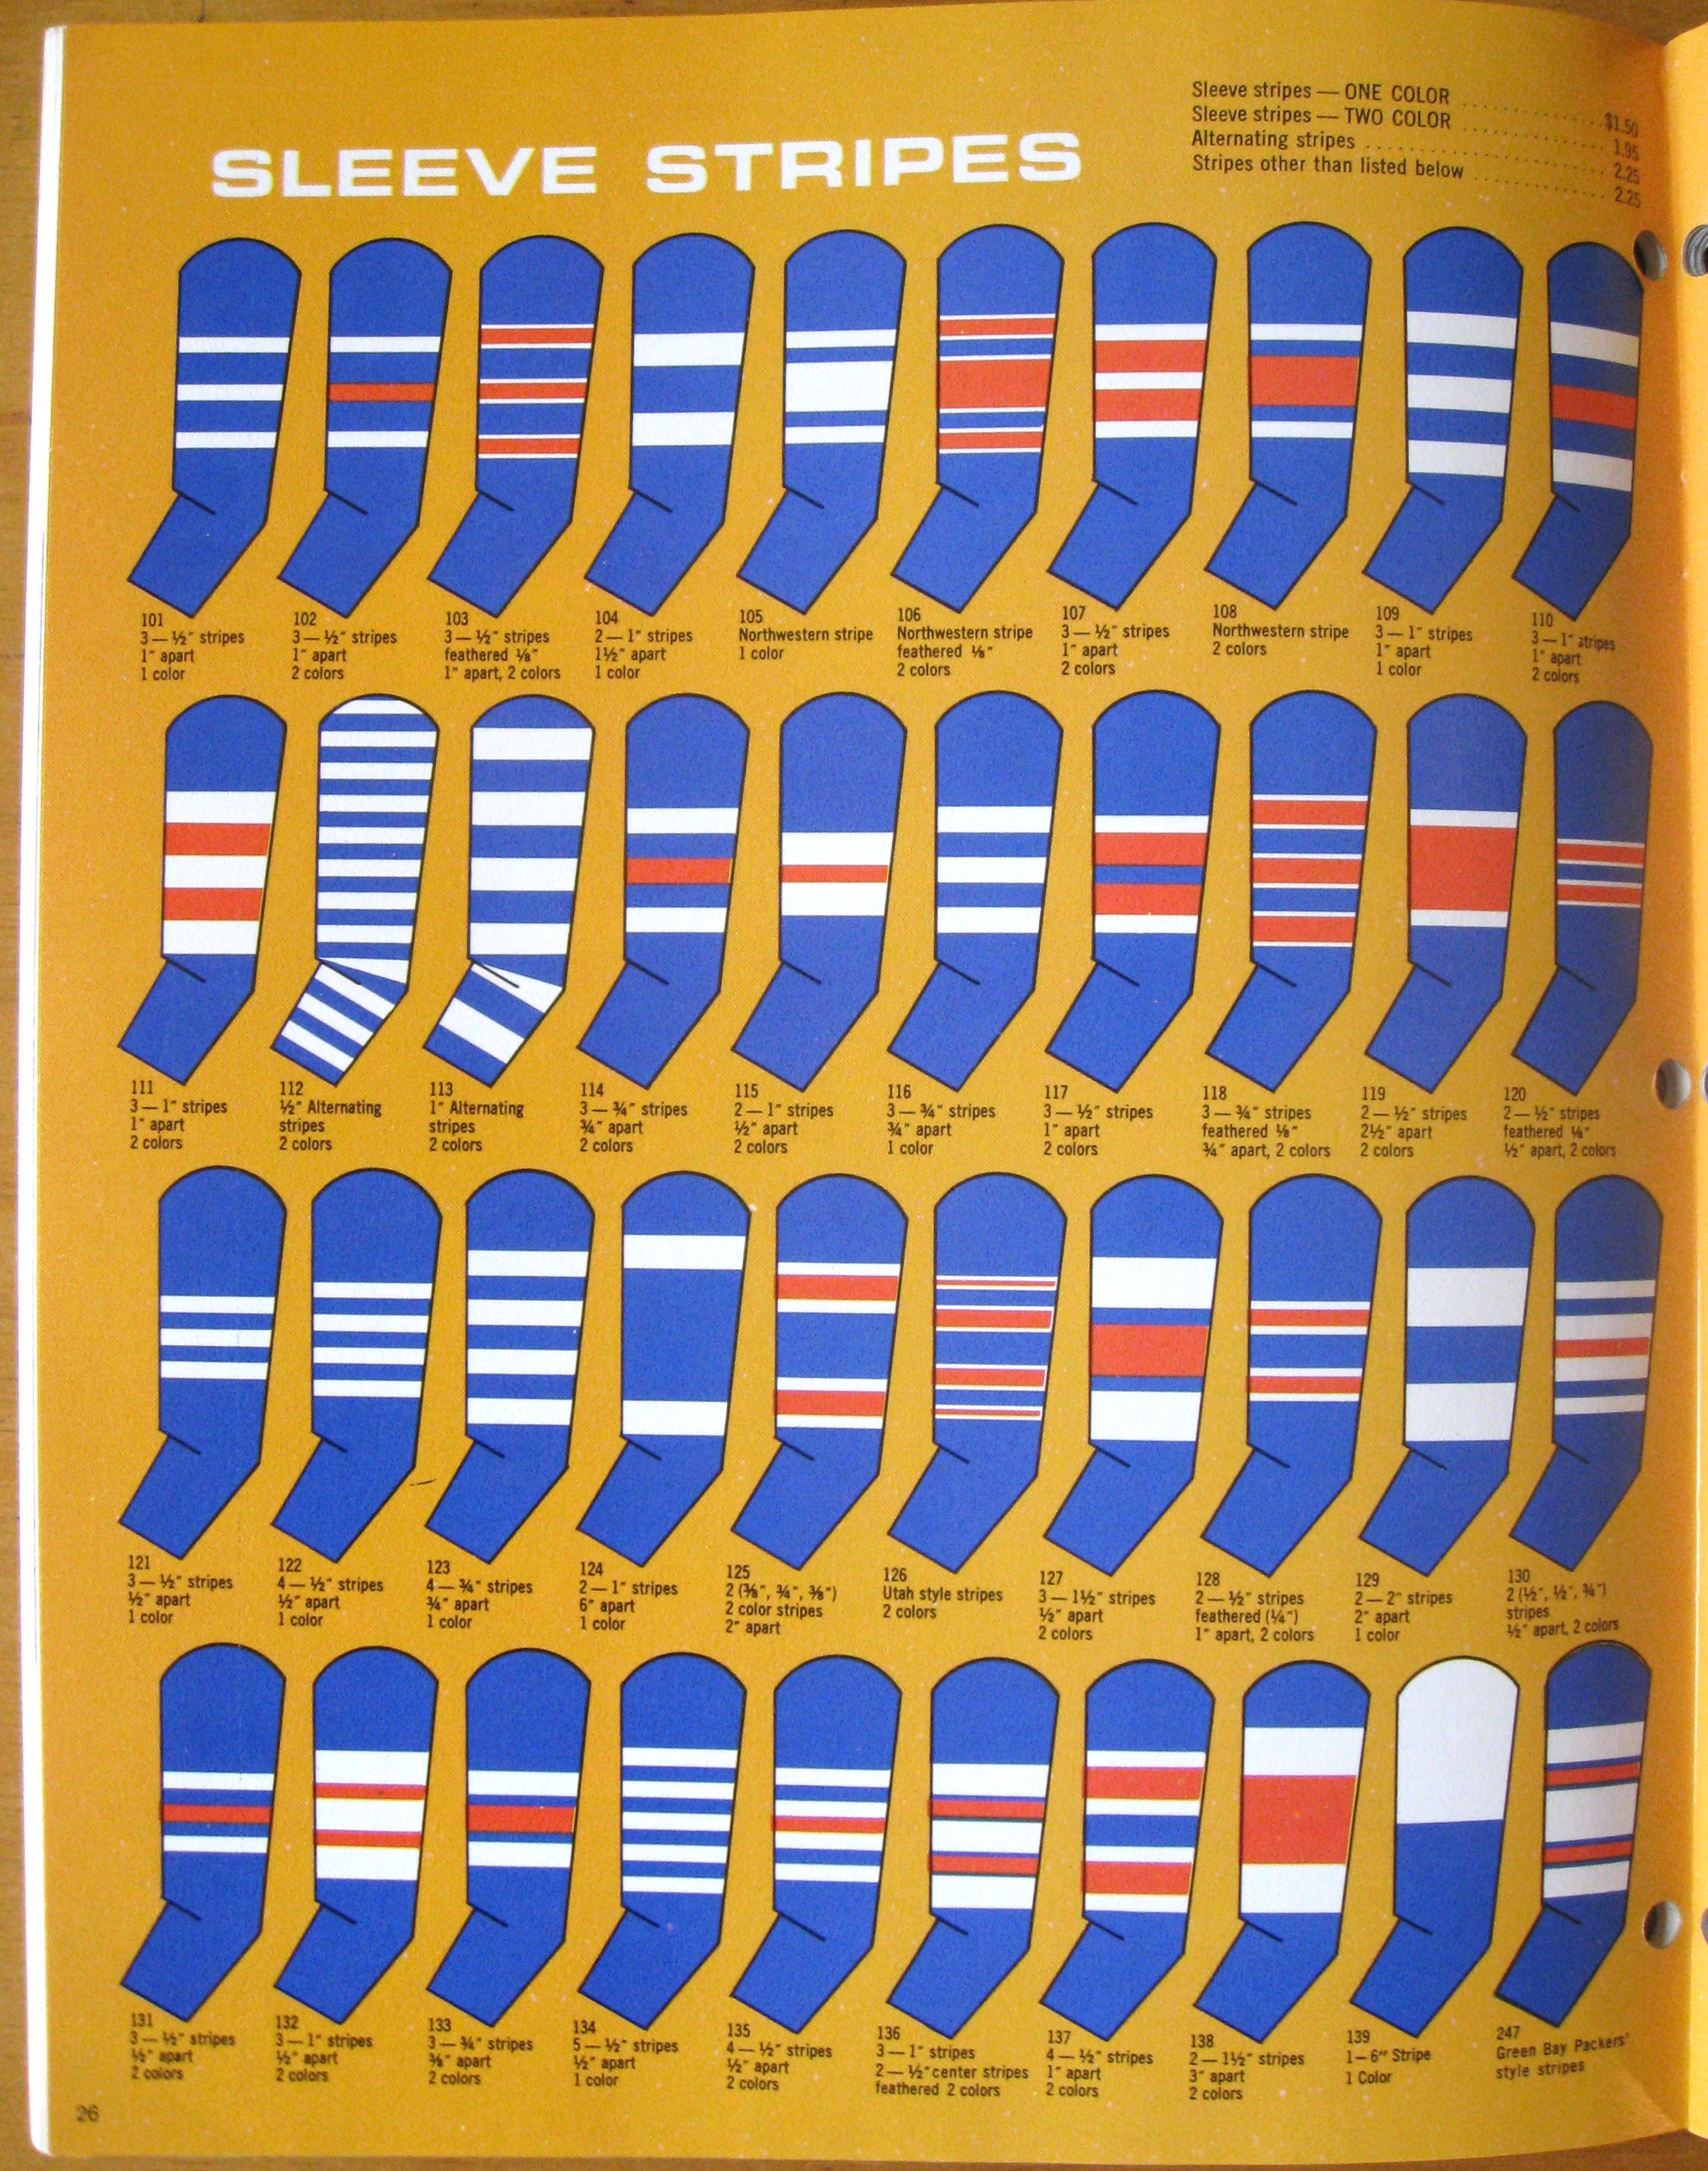 stripey blue color